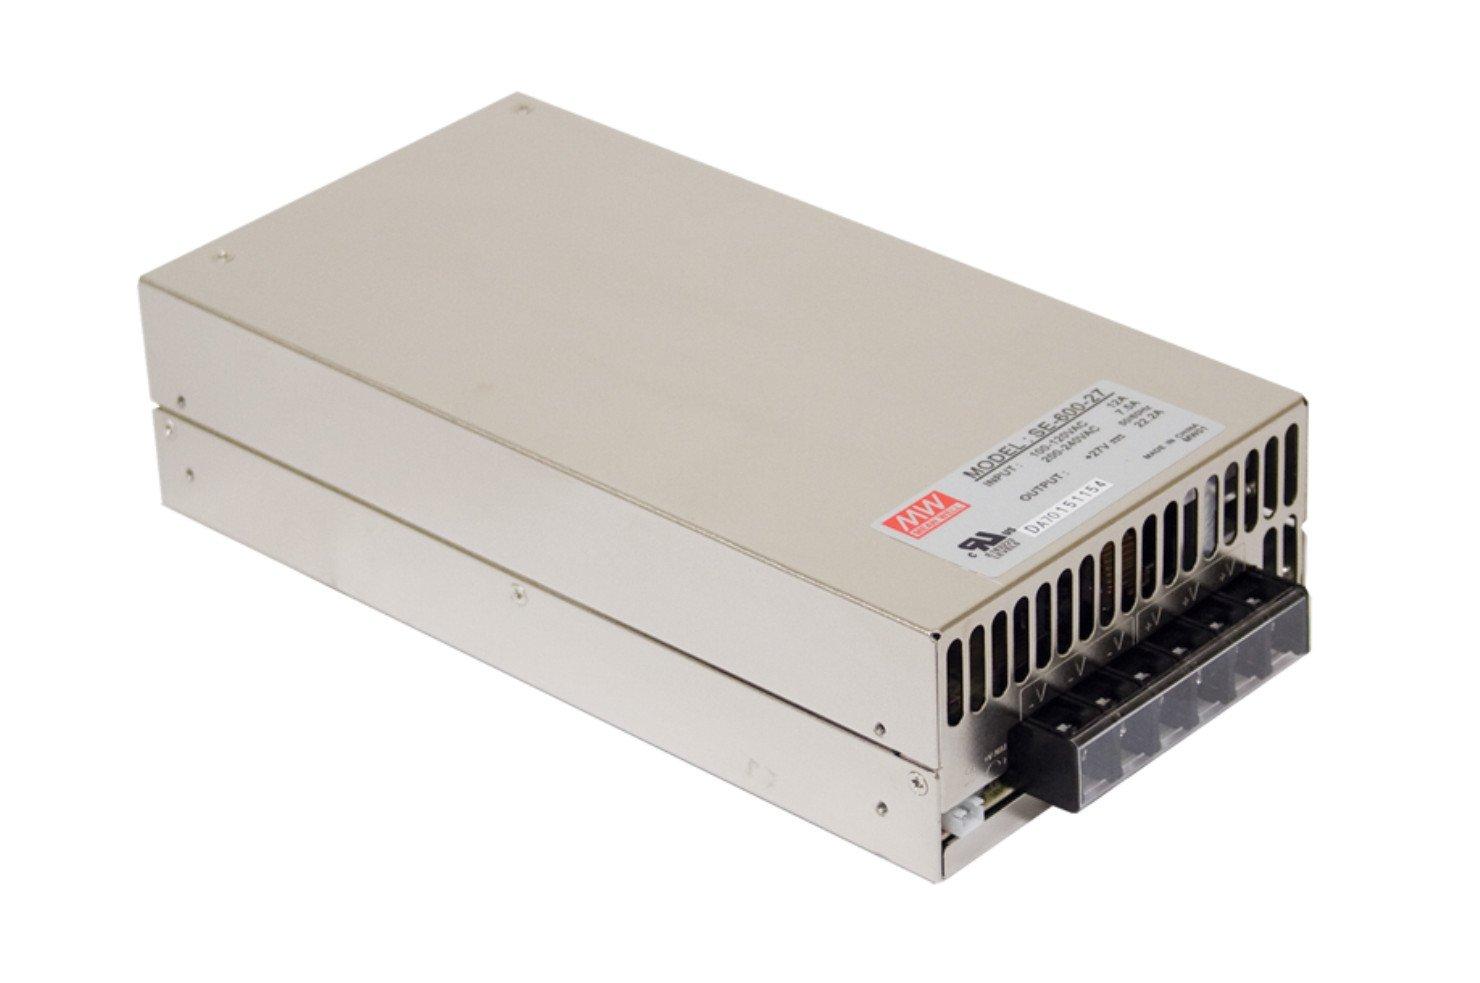 MEAN WELL original SE-600-5 5V 100A meanwell SE-600 5V 500W Single Output Power Supply